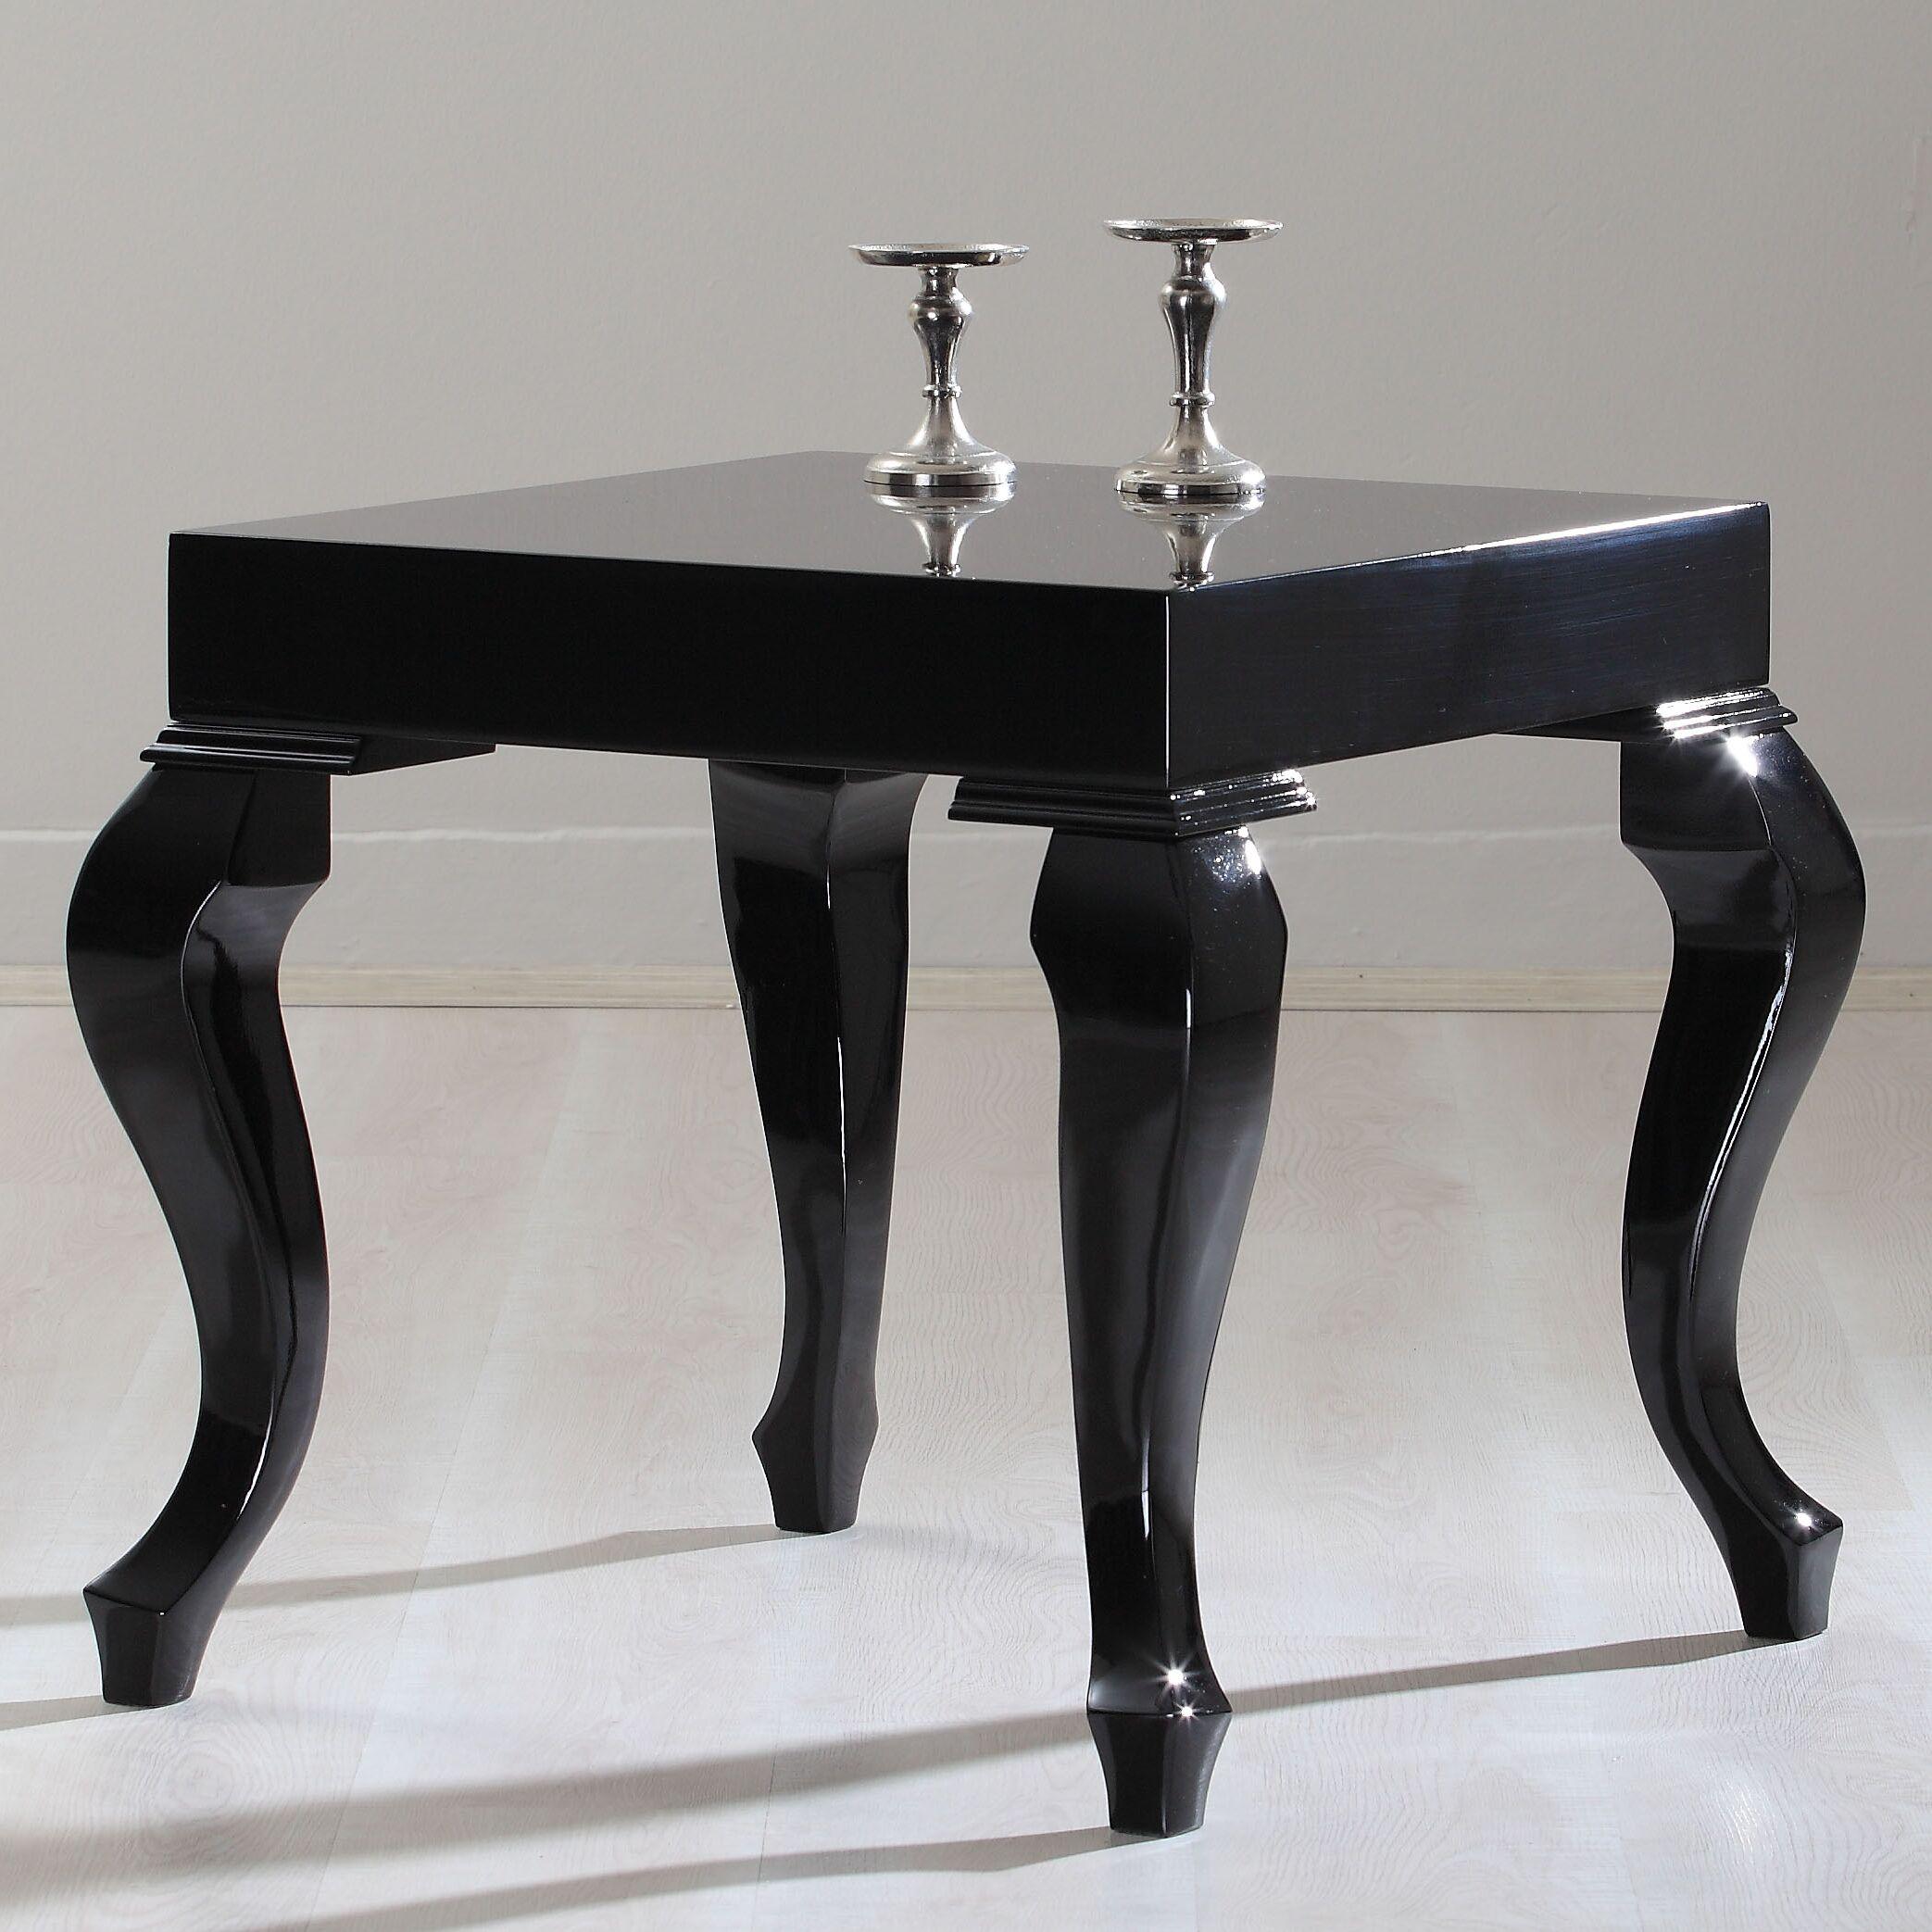 Lukens End Table Color: Black Lacquer